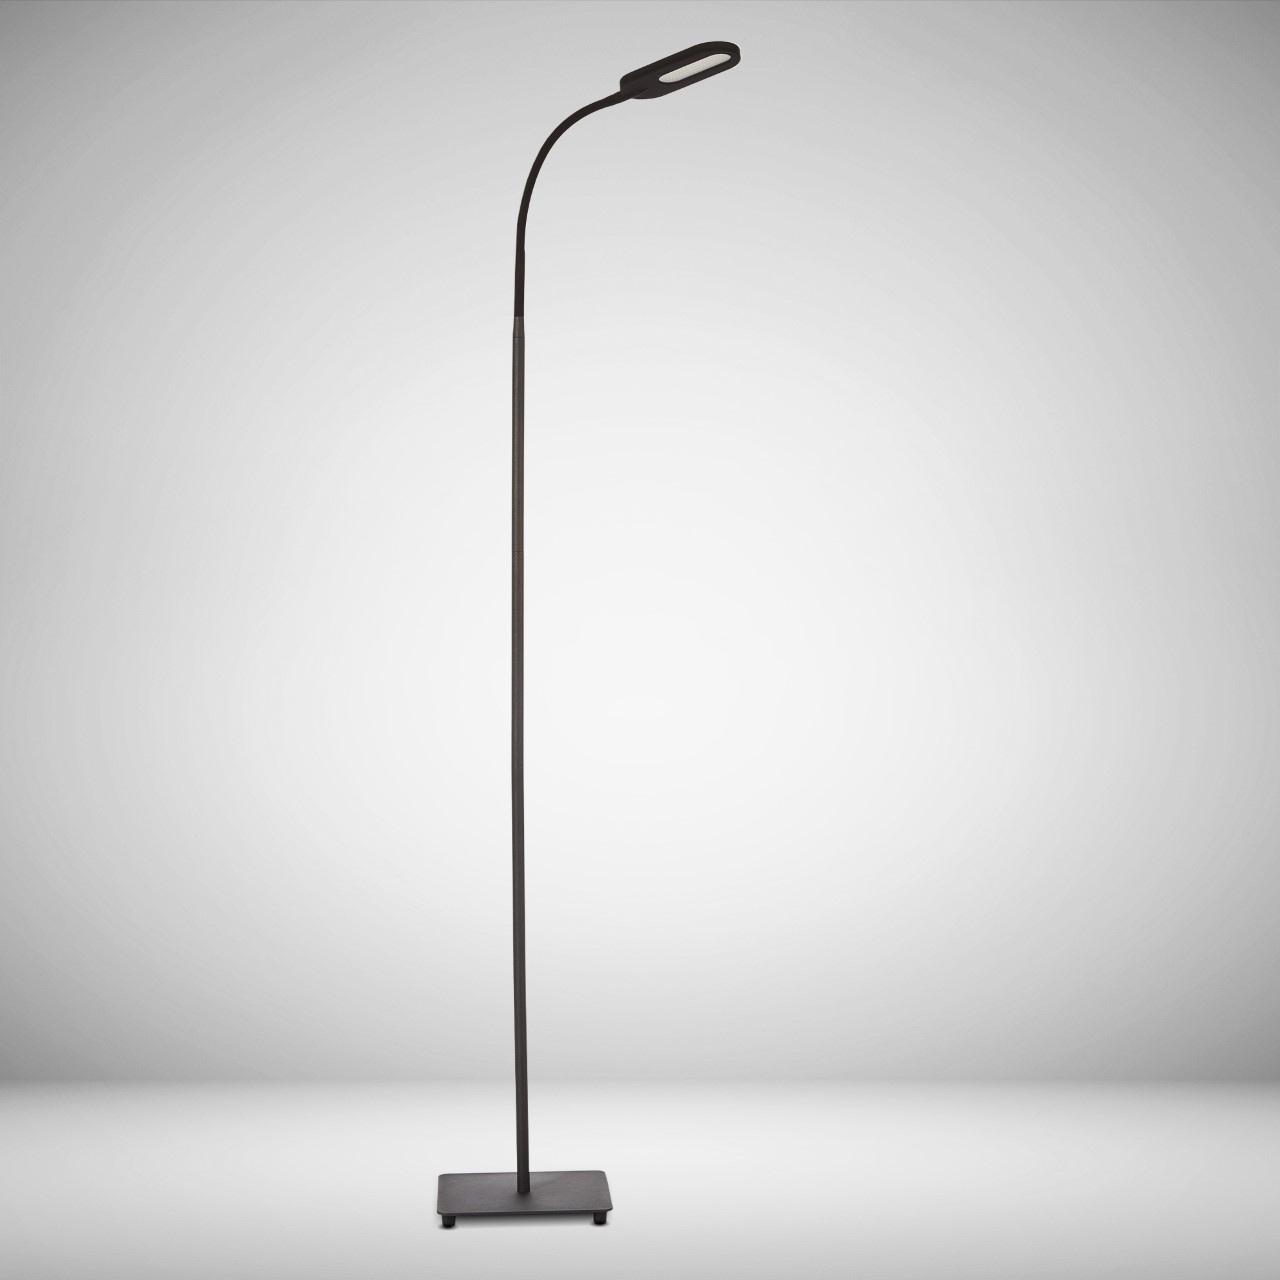 B.K.Licht LED Stehlampe, LED-Board, Warmweiß-Neutralweiß-Kaltweiß, LED Stehleuchte dimmbar schwenkbar Memory & Touch Funktion inkl. 8W 600lm